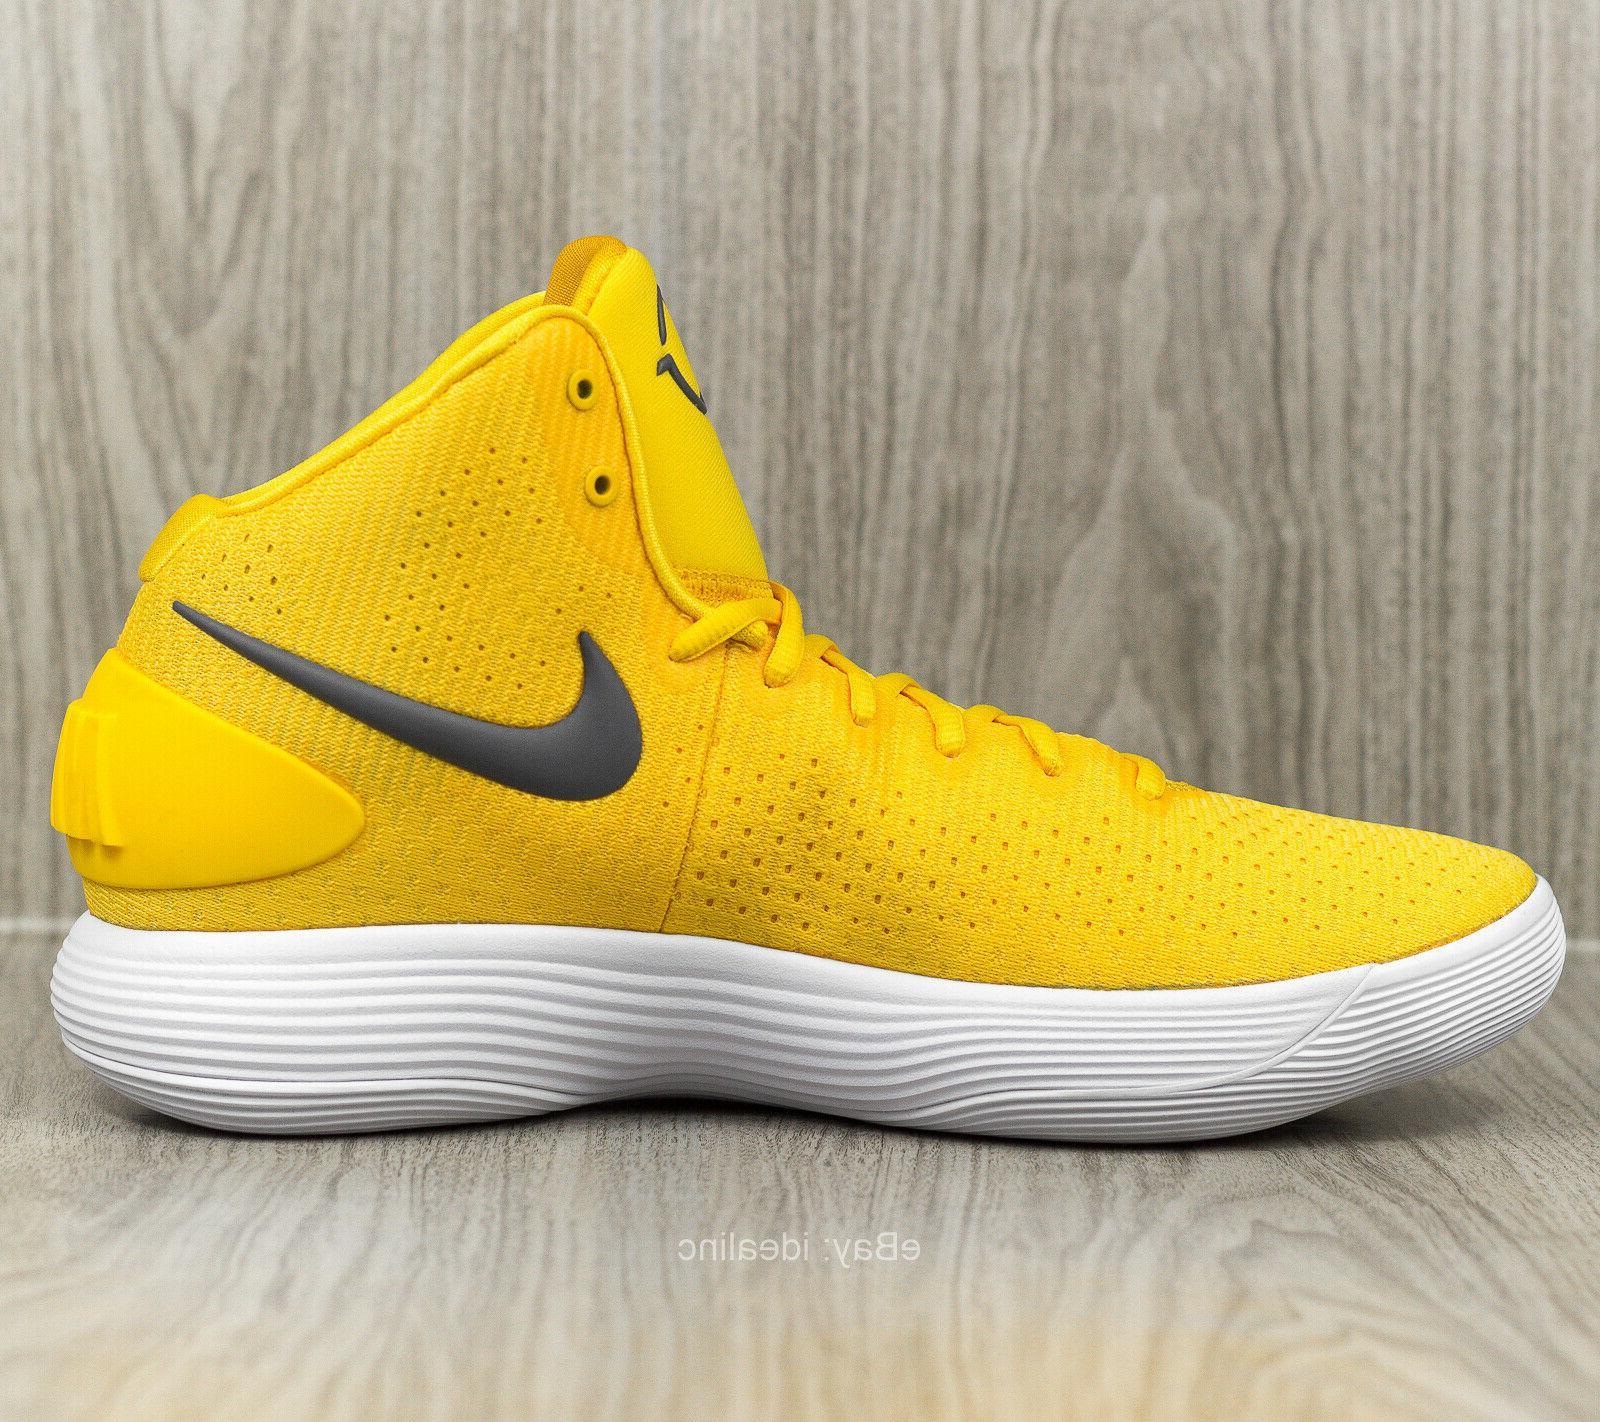 Nike Hyperdunk Men's 13 Basketball Shoes 942571-703